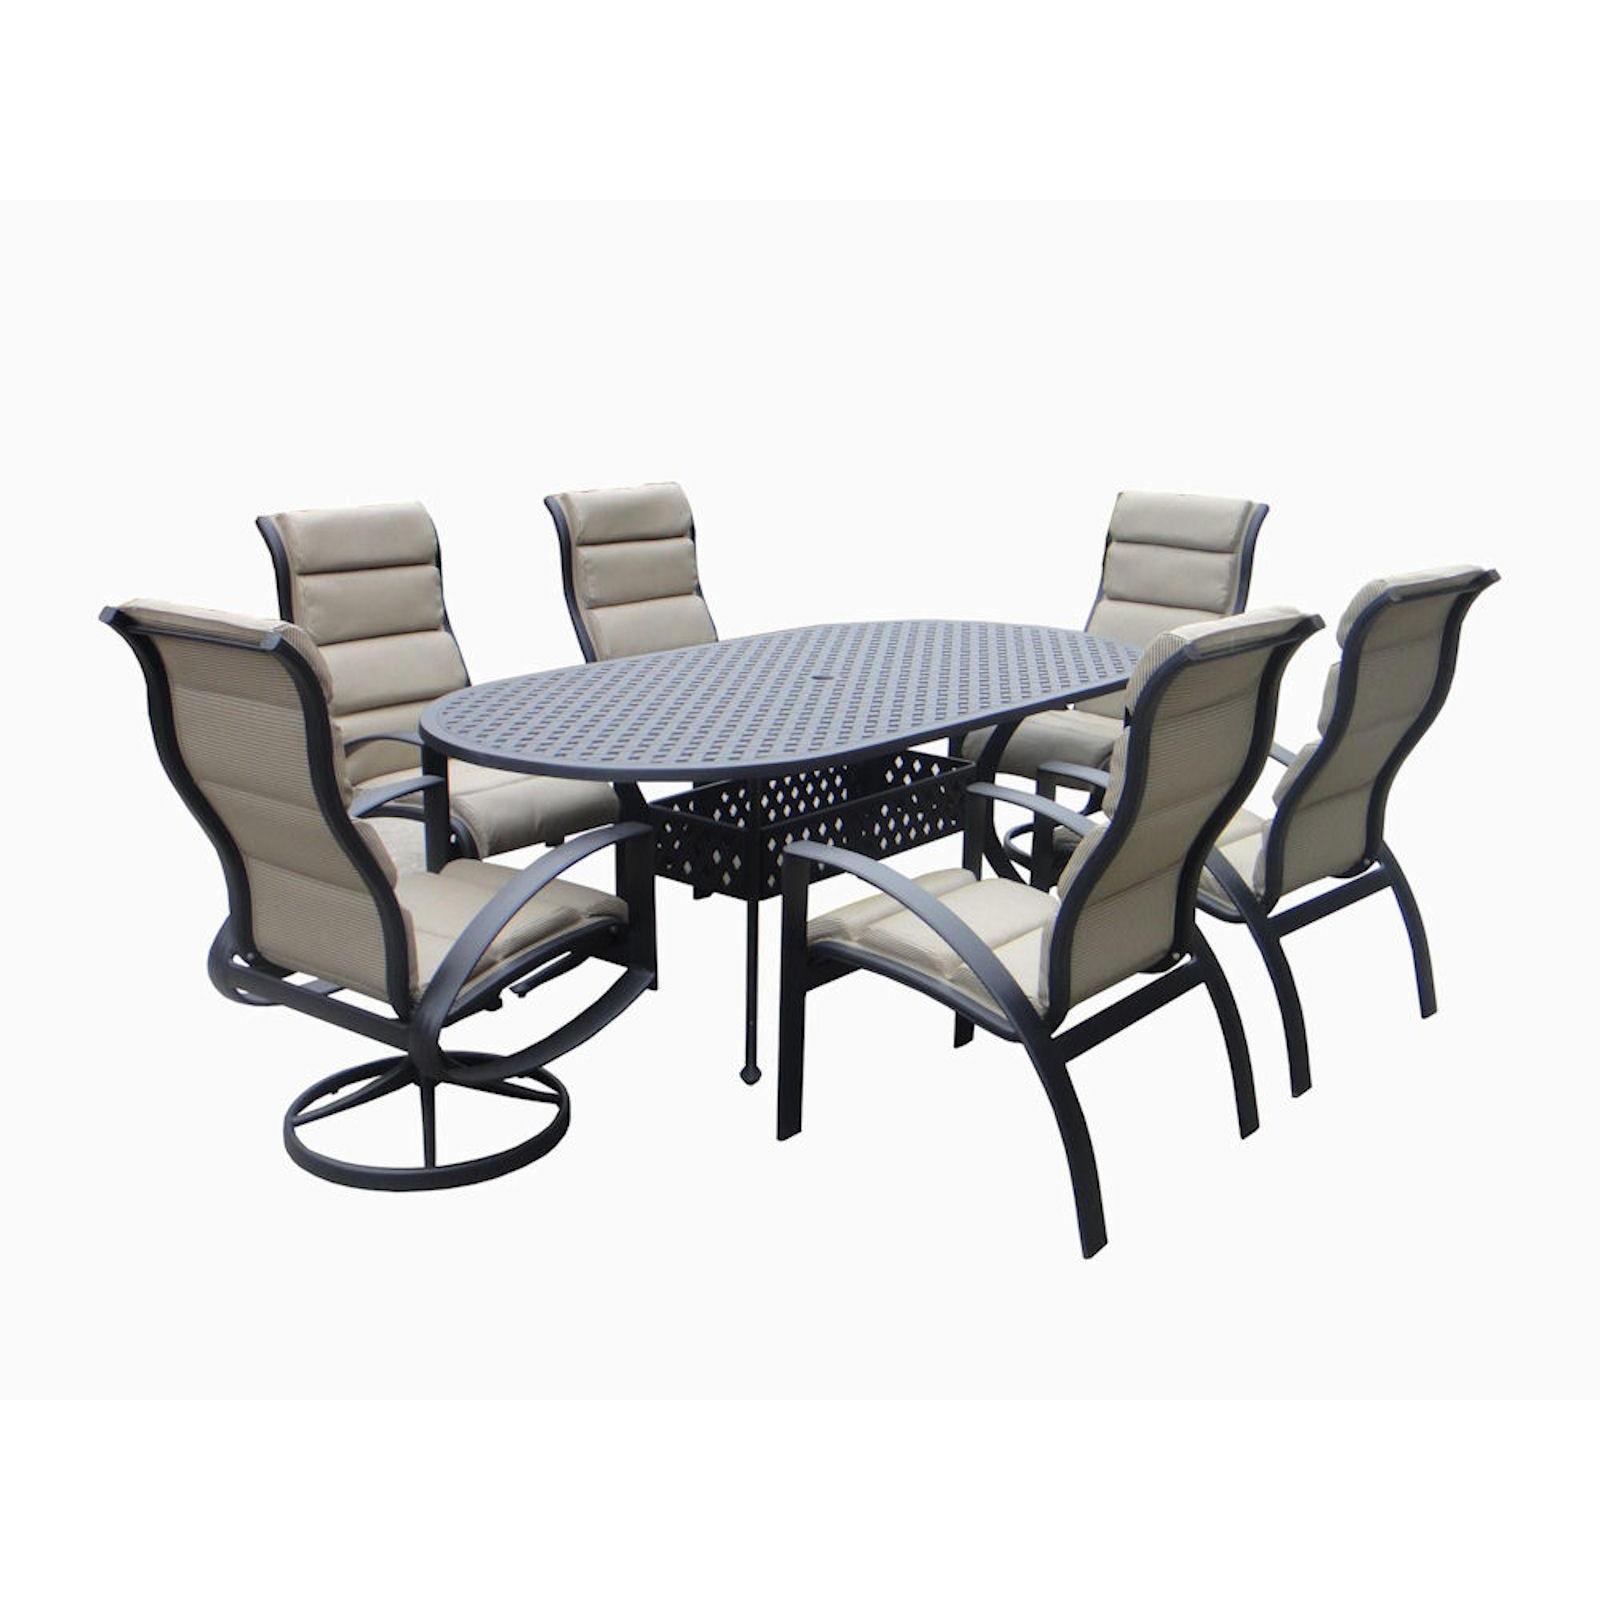 Outdoor Patio Furniture Savannah Ga: Savannah Outdoor Classics Helios Aluminum Sling Patio